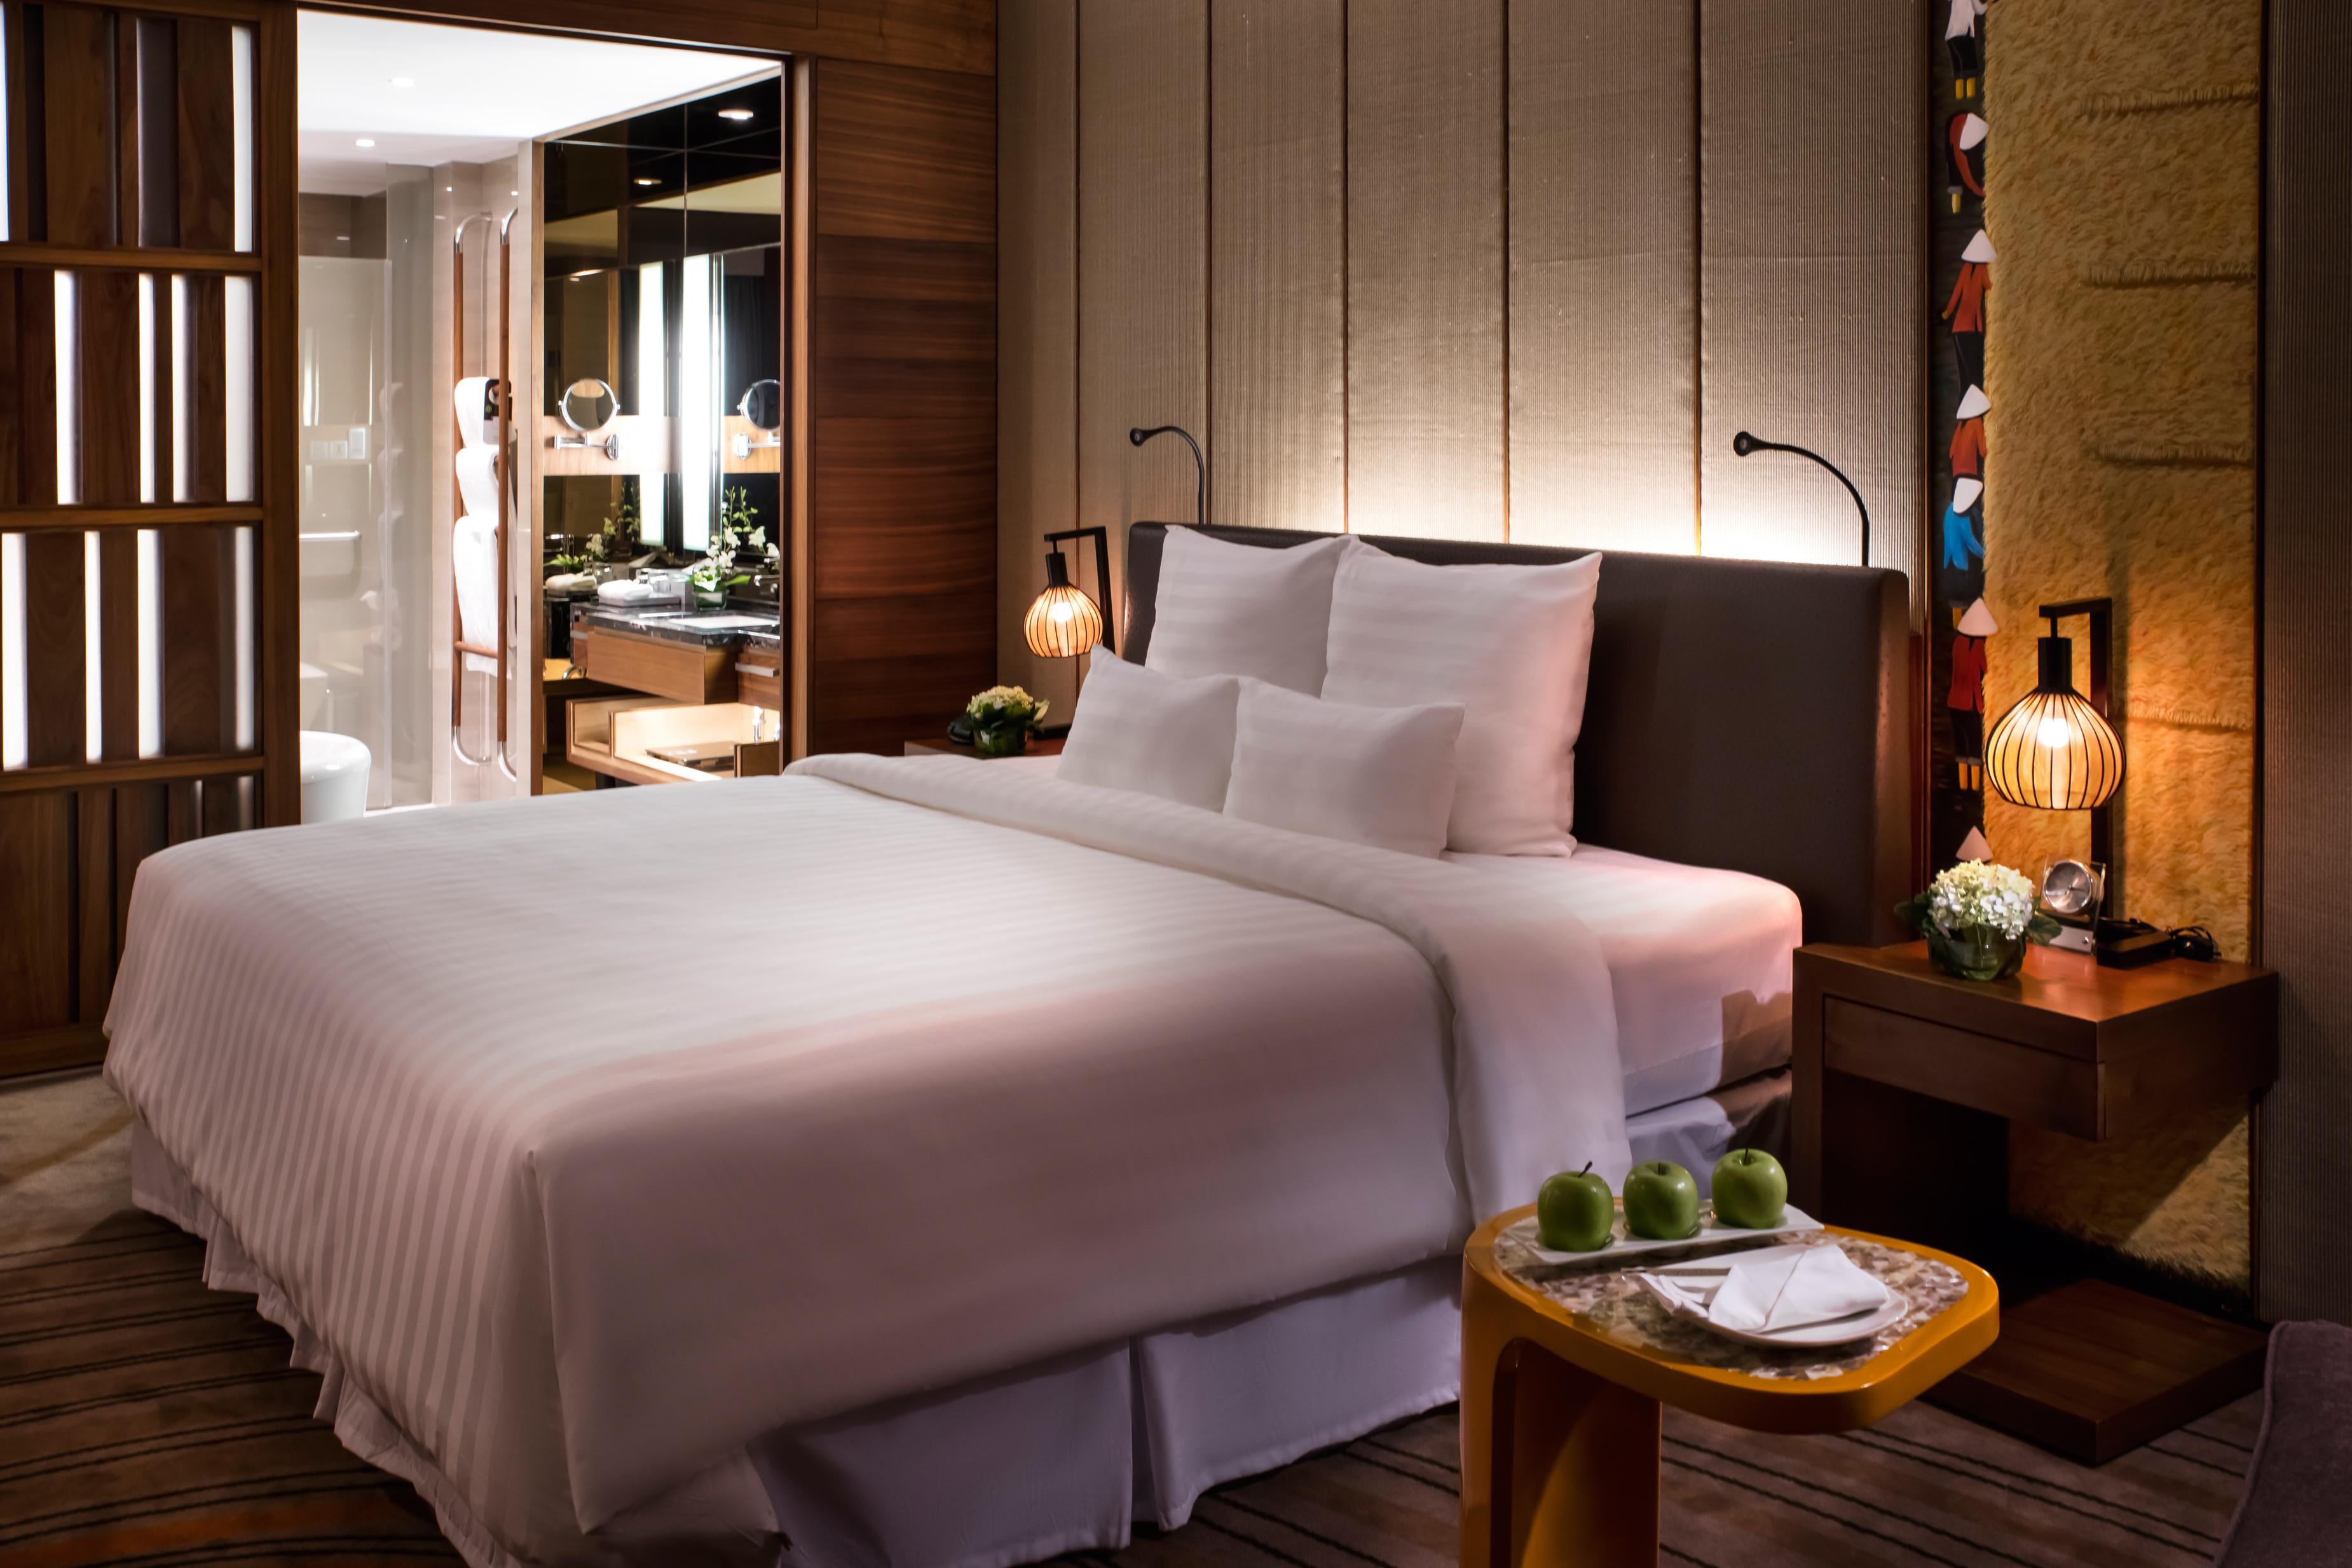 Accorhotels Unveils Pullman Vung Tau The 4th Pullman